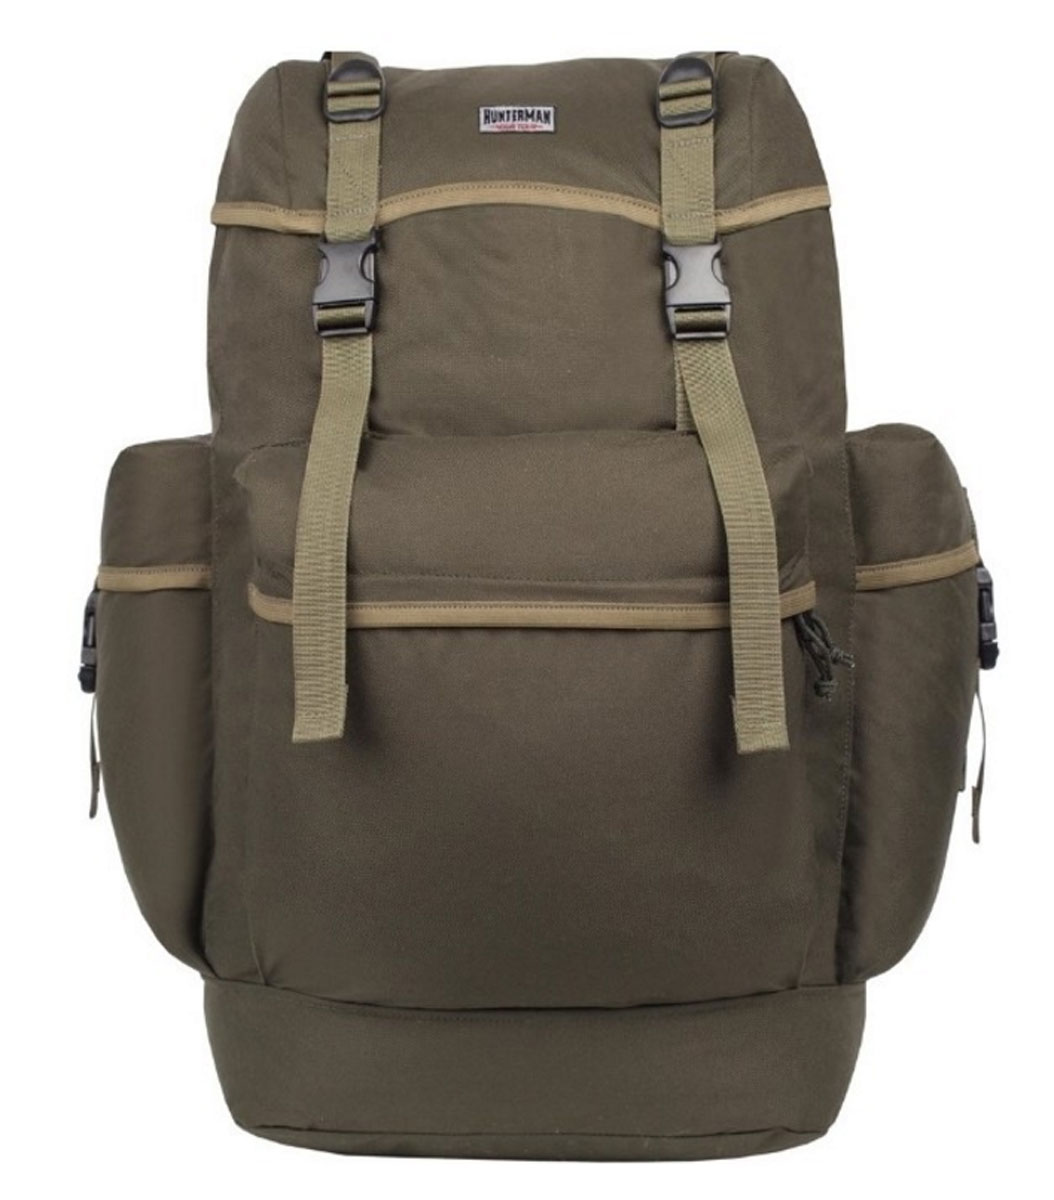 Рюкзак для охоты Hunter Nova Tour Охотник 70 V3, цвет: зеленый, 70 л